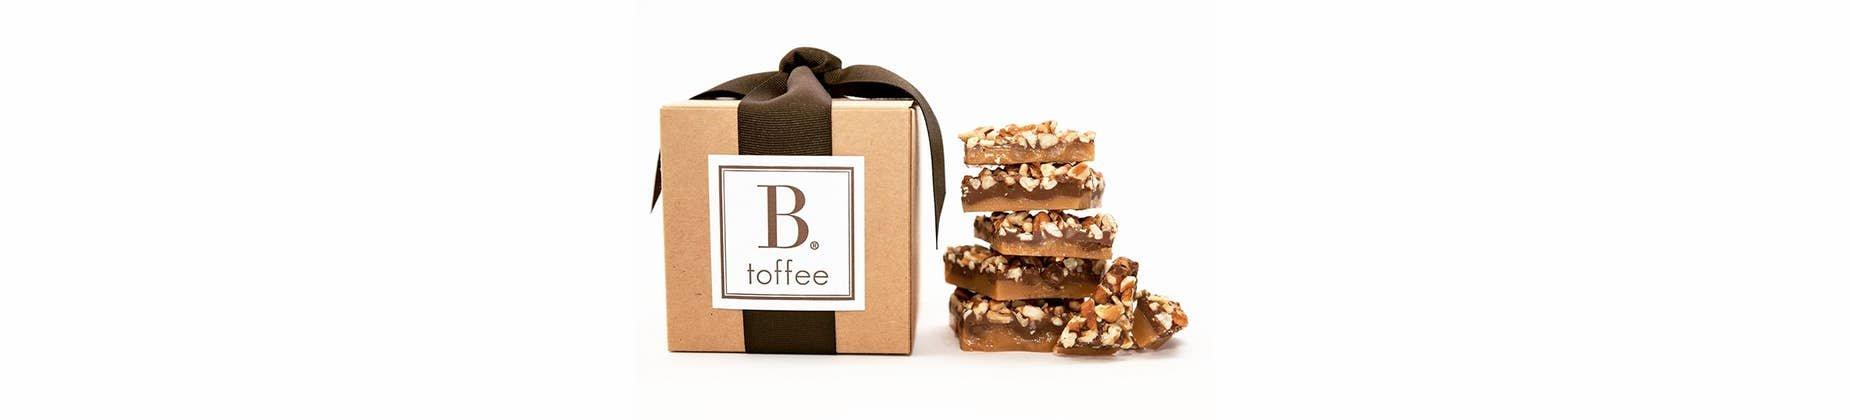 B Toffee Milk Chocolate